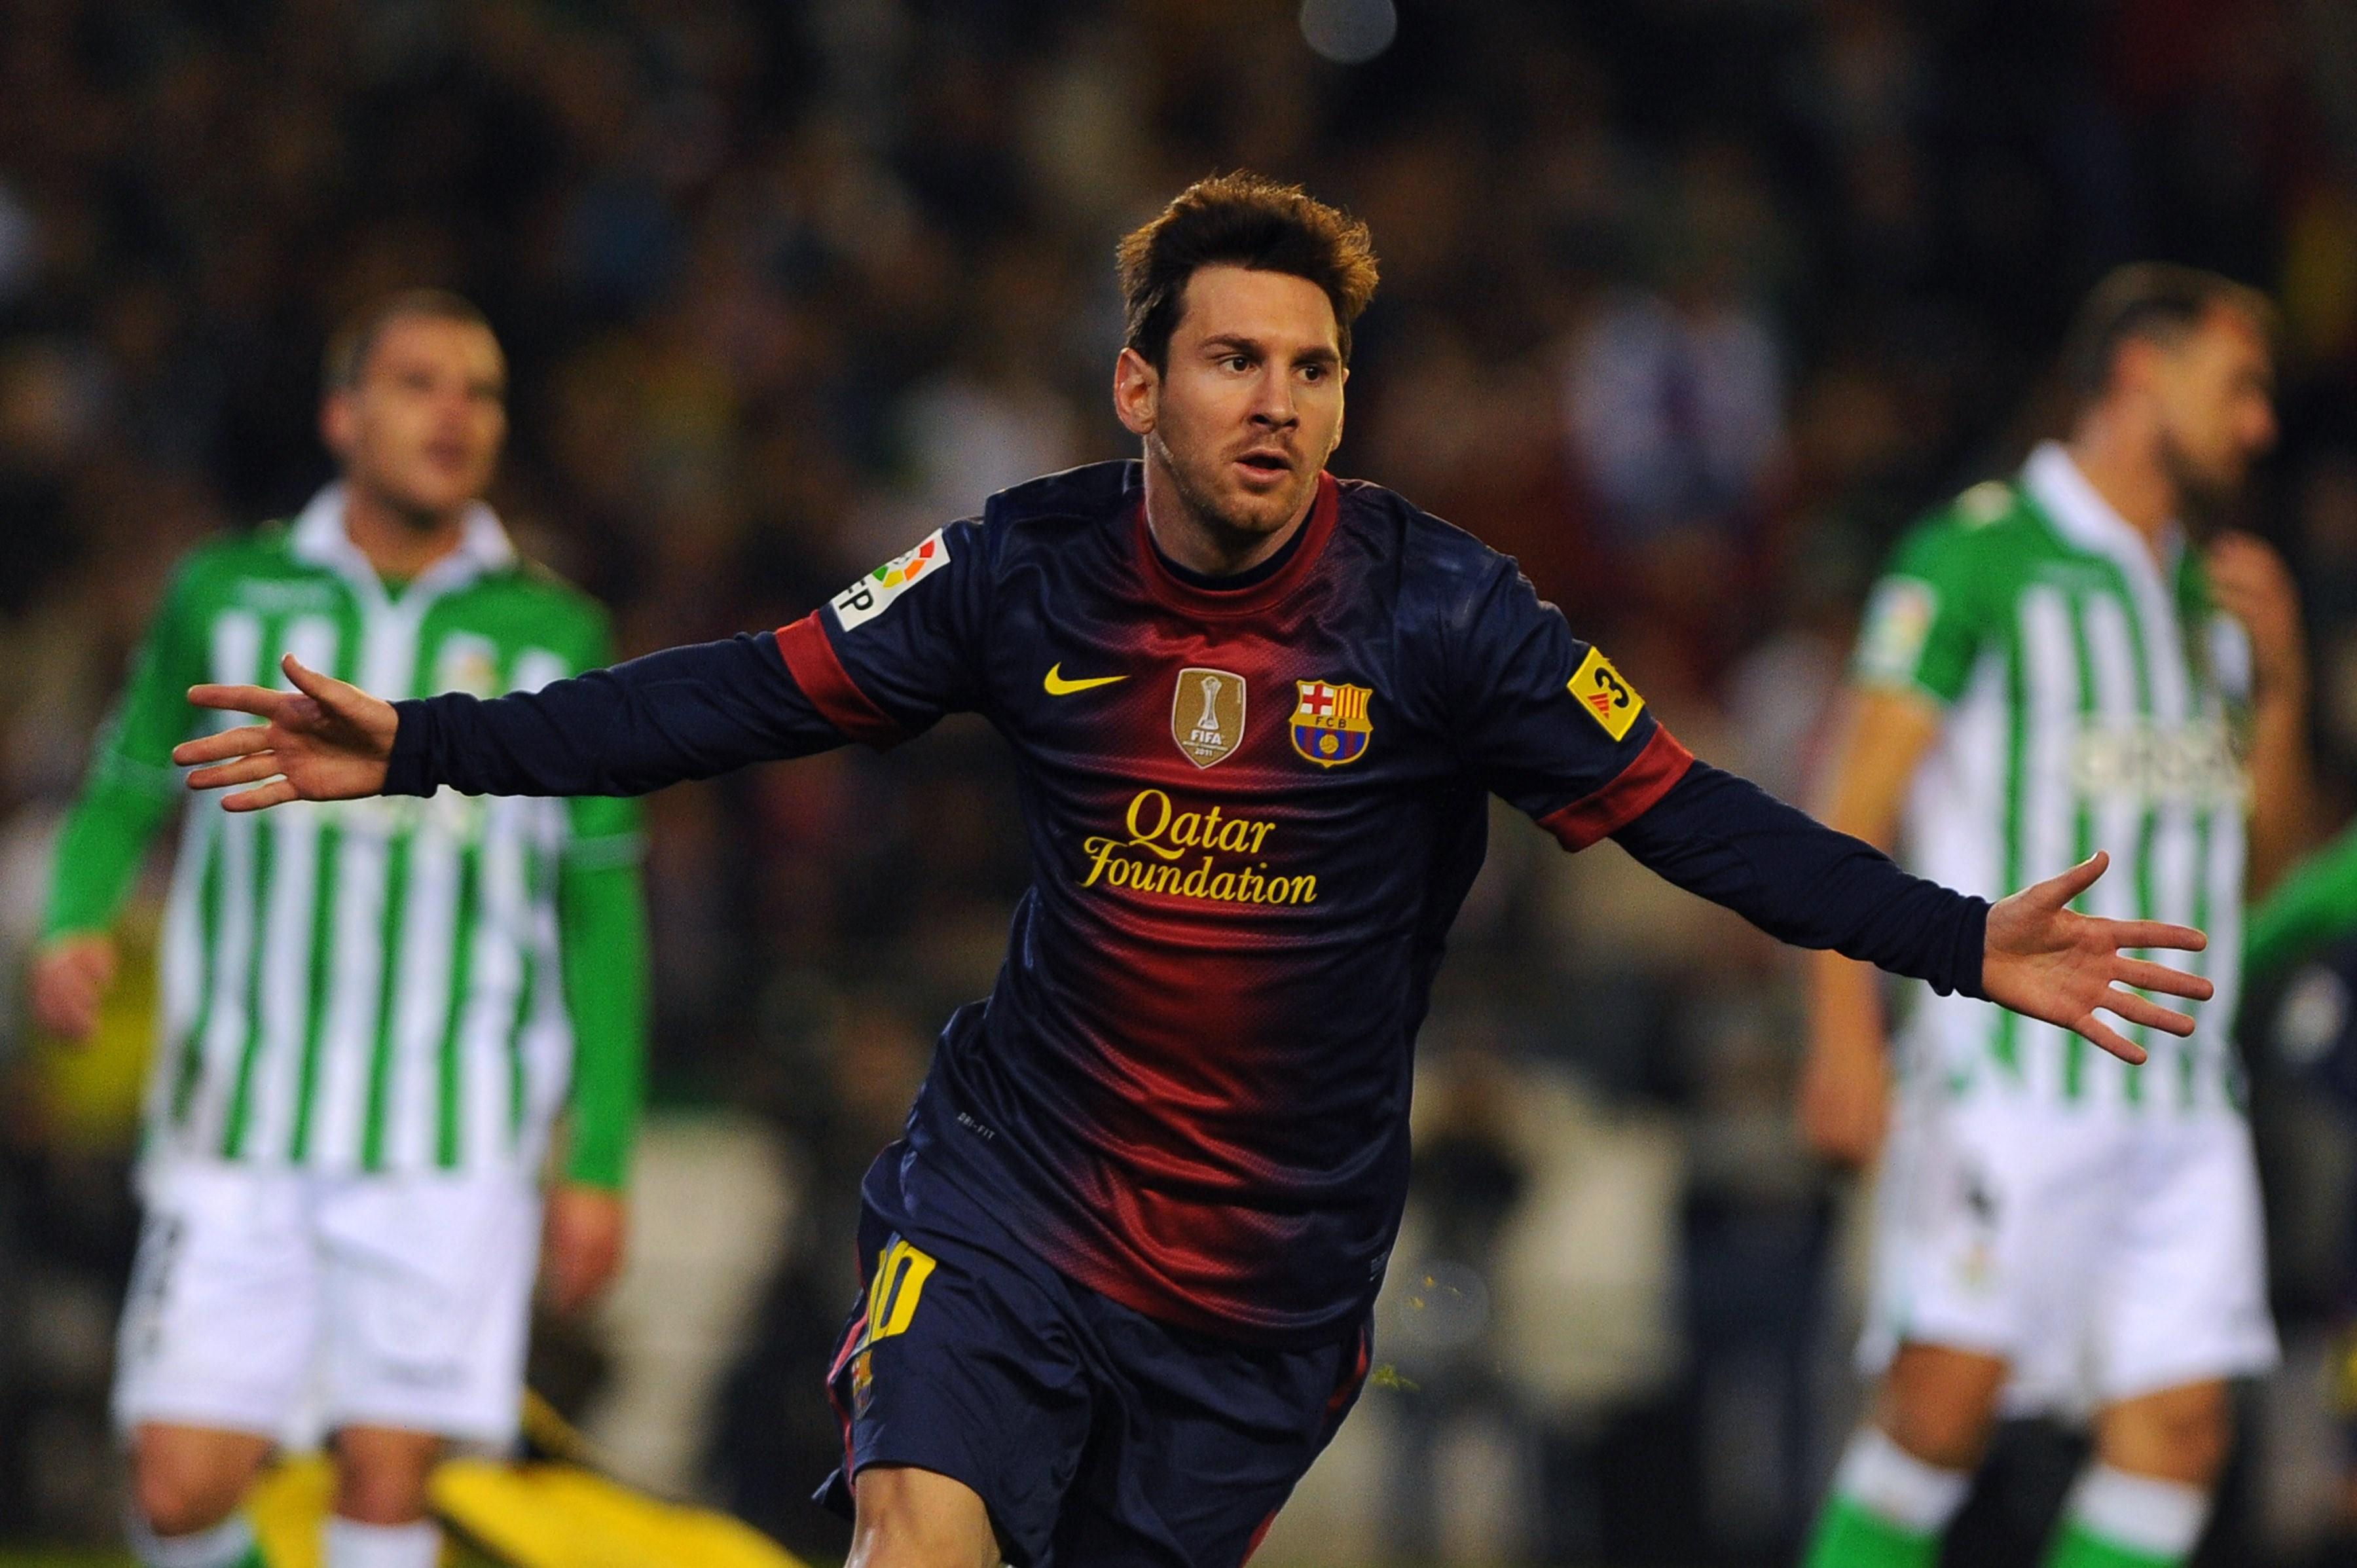 Lionel Messi bags brace to break Gerd Muller's 40-year goalscoring record